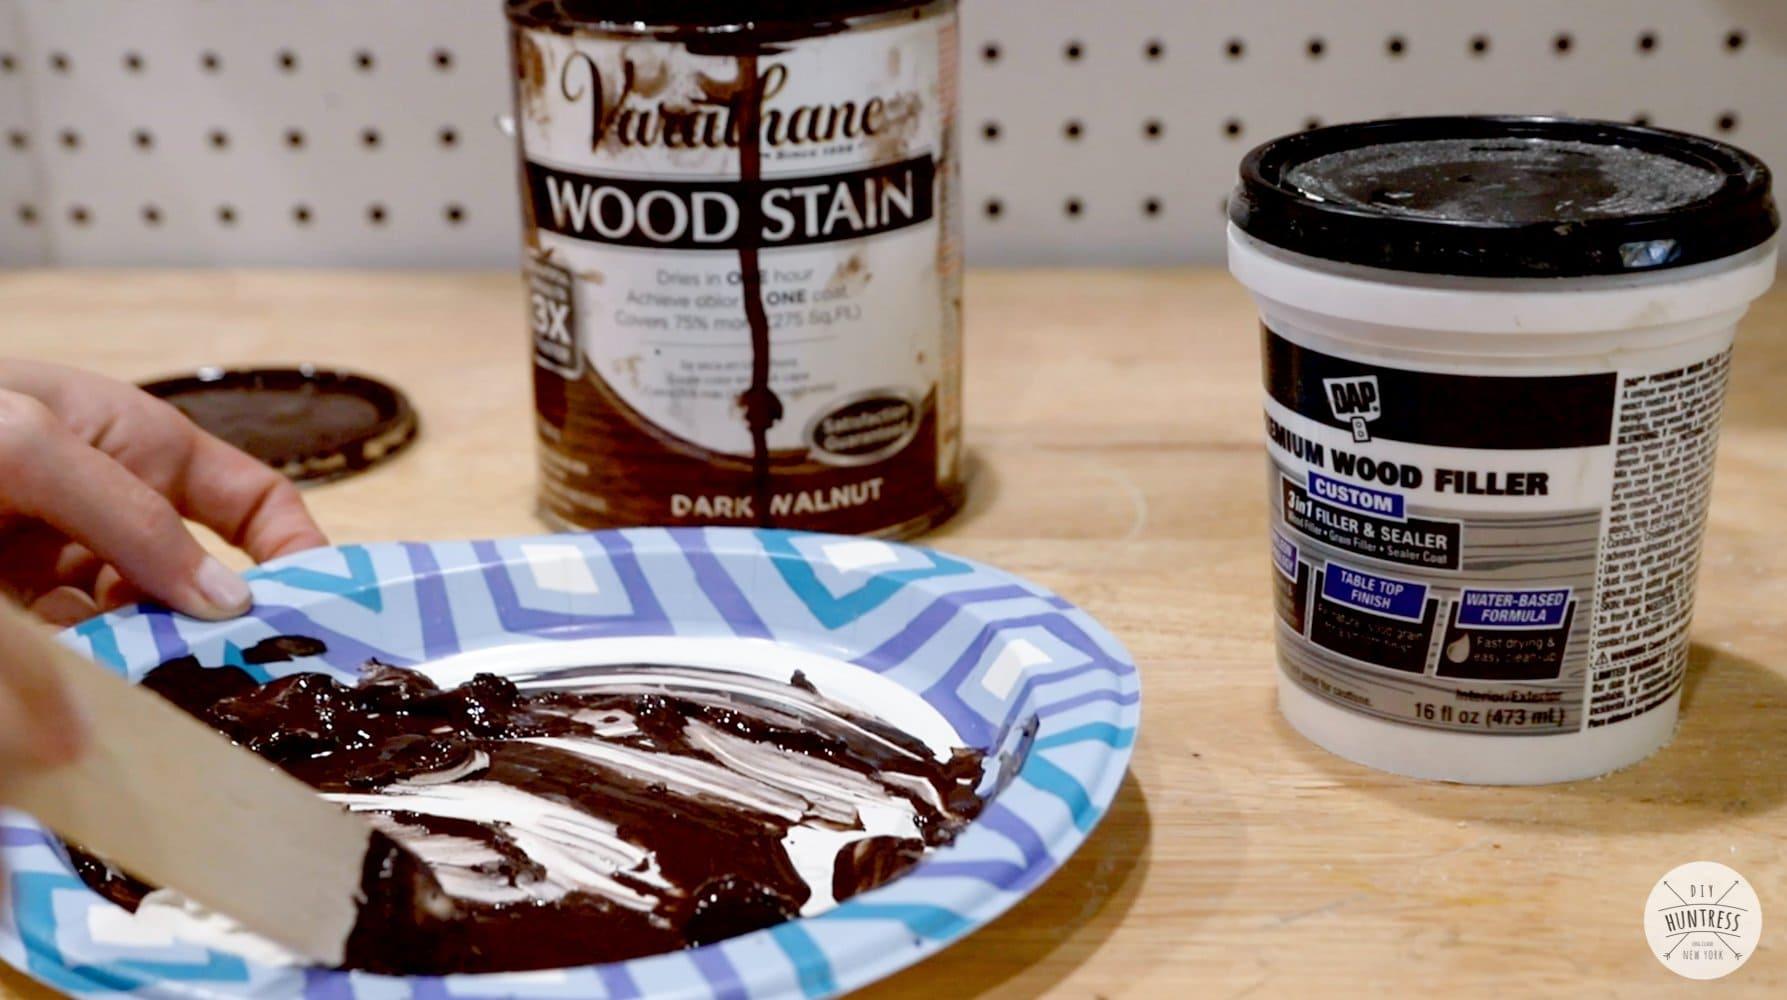 dap premium wood filler tinted putty